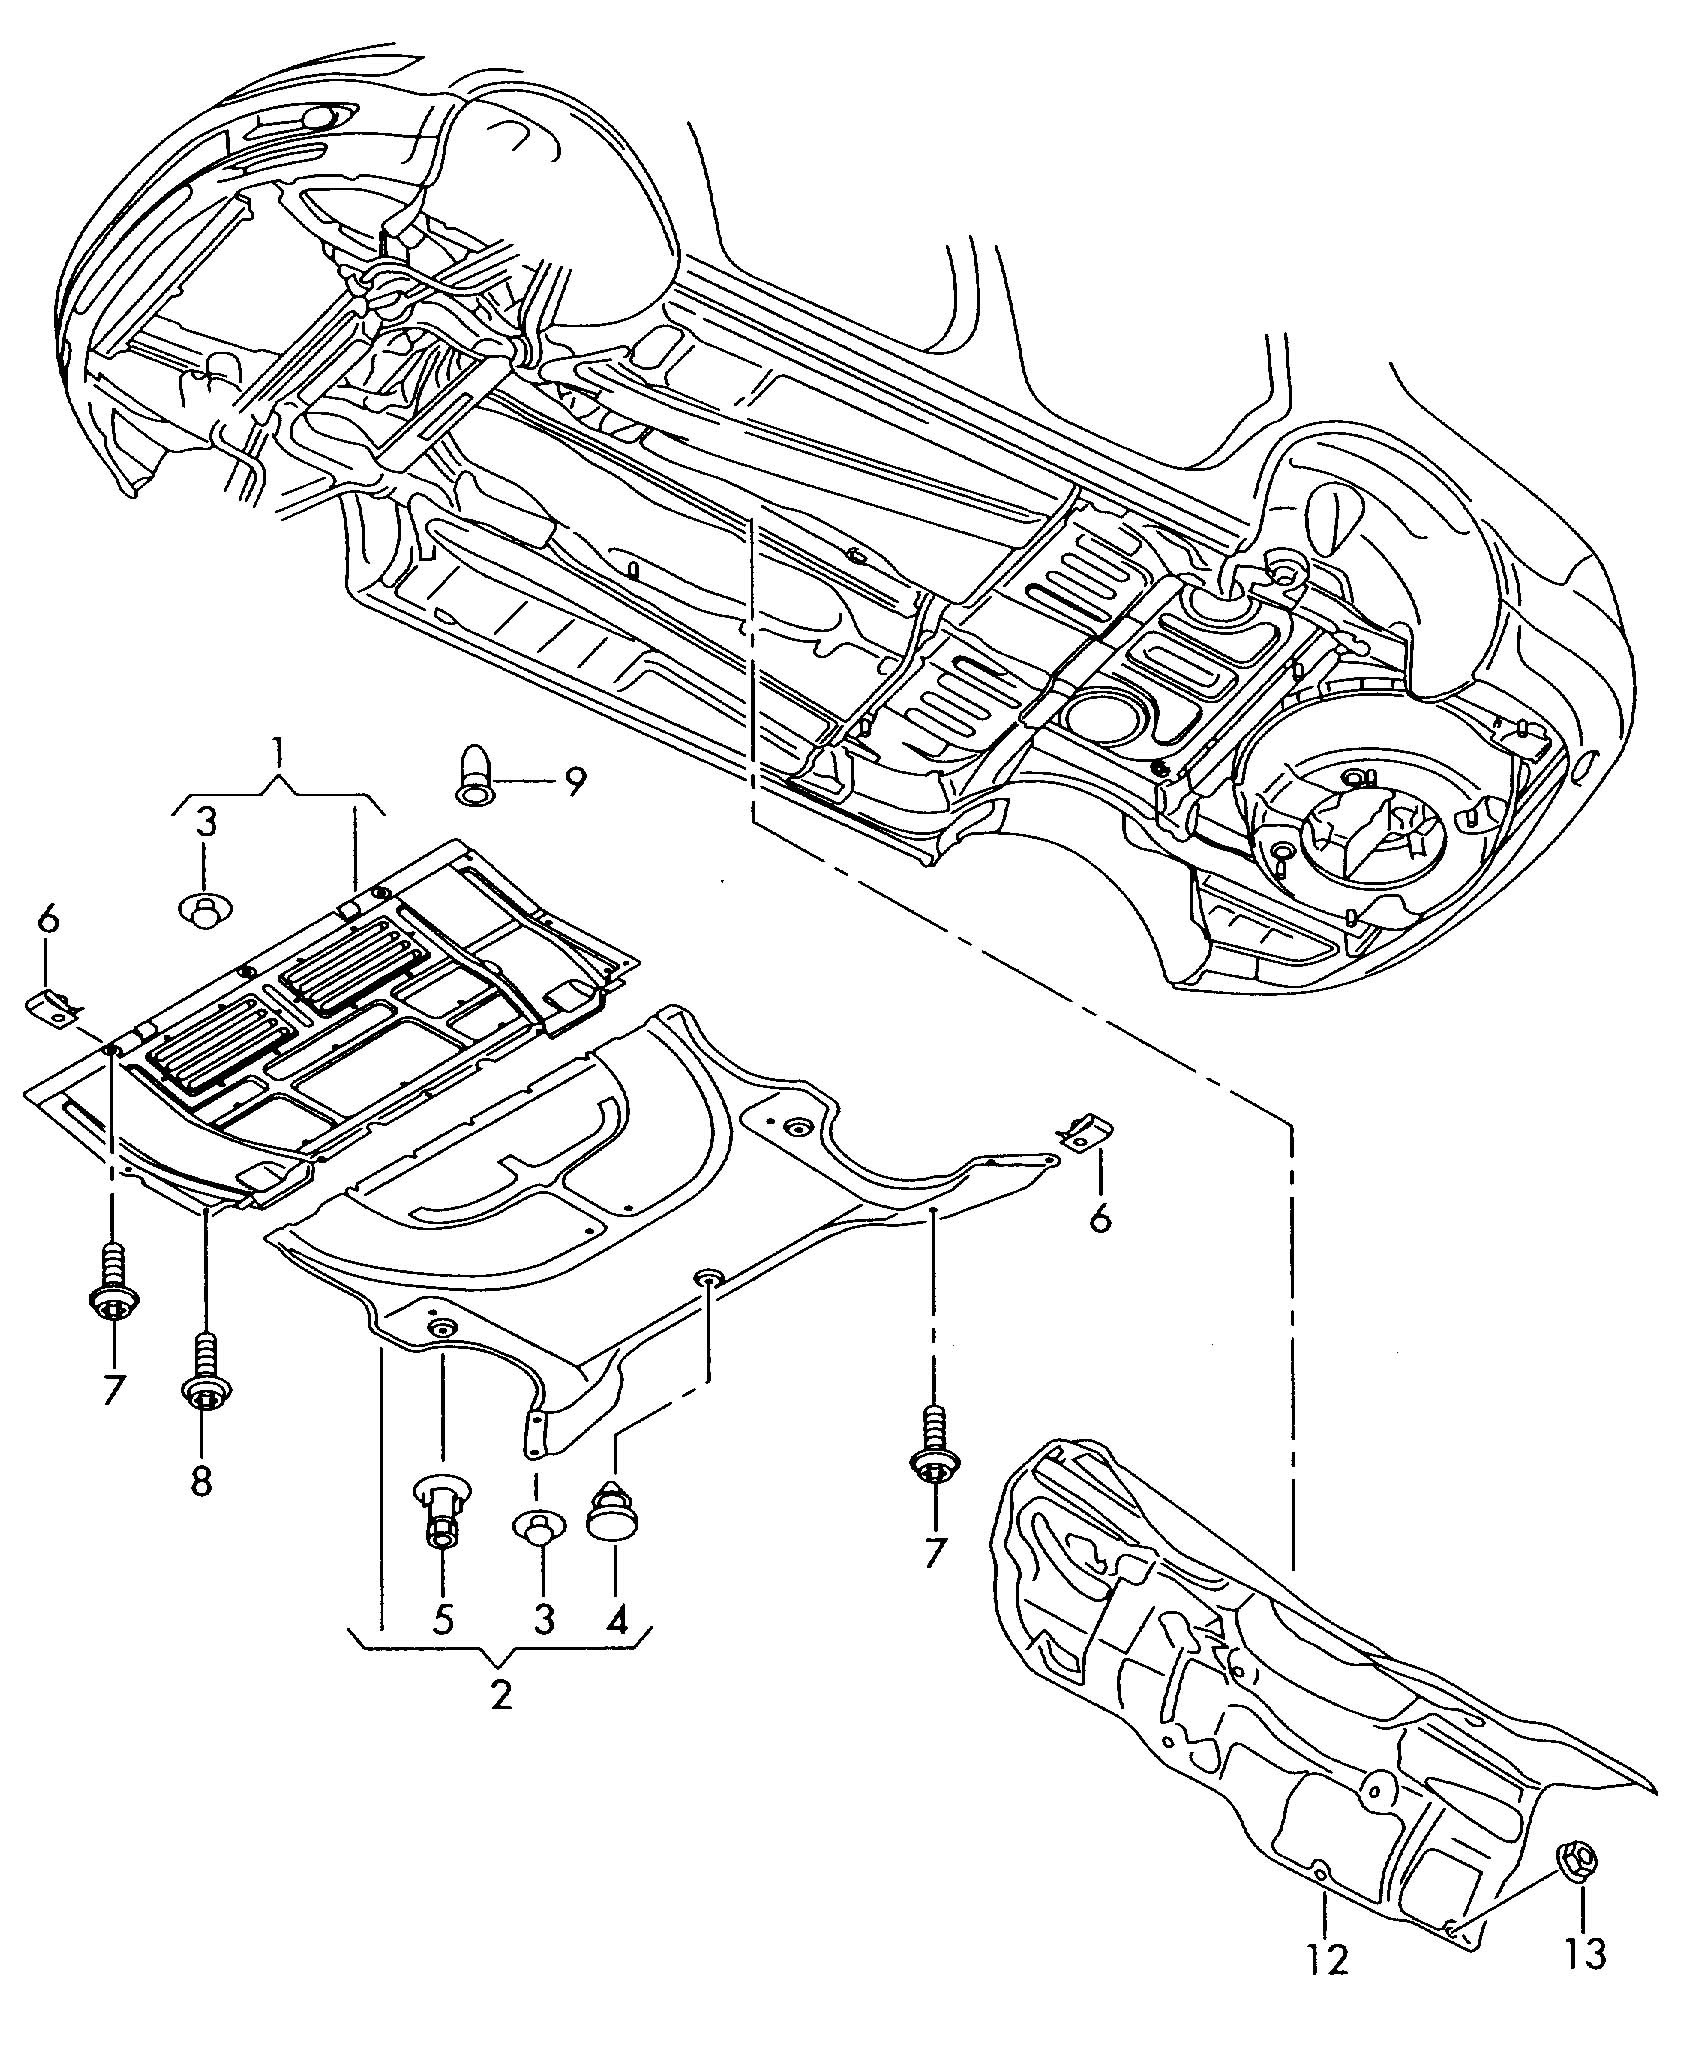 Diagram Of Car Underside Vwvortex Broken Underbody Shield and Missing Fasteners Of Diagram Of Car Underside